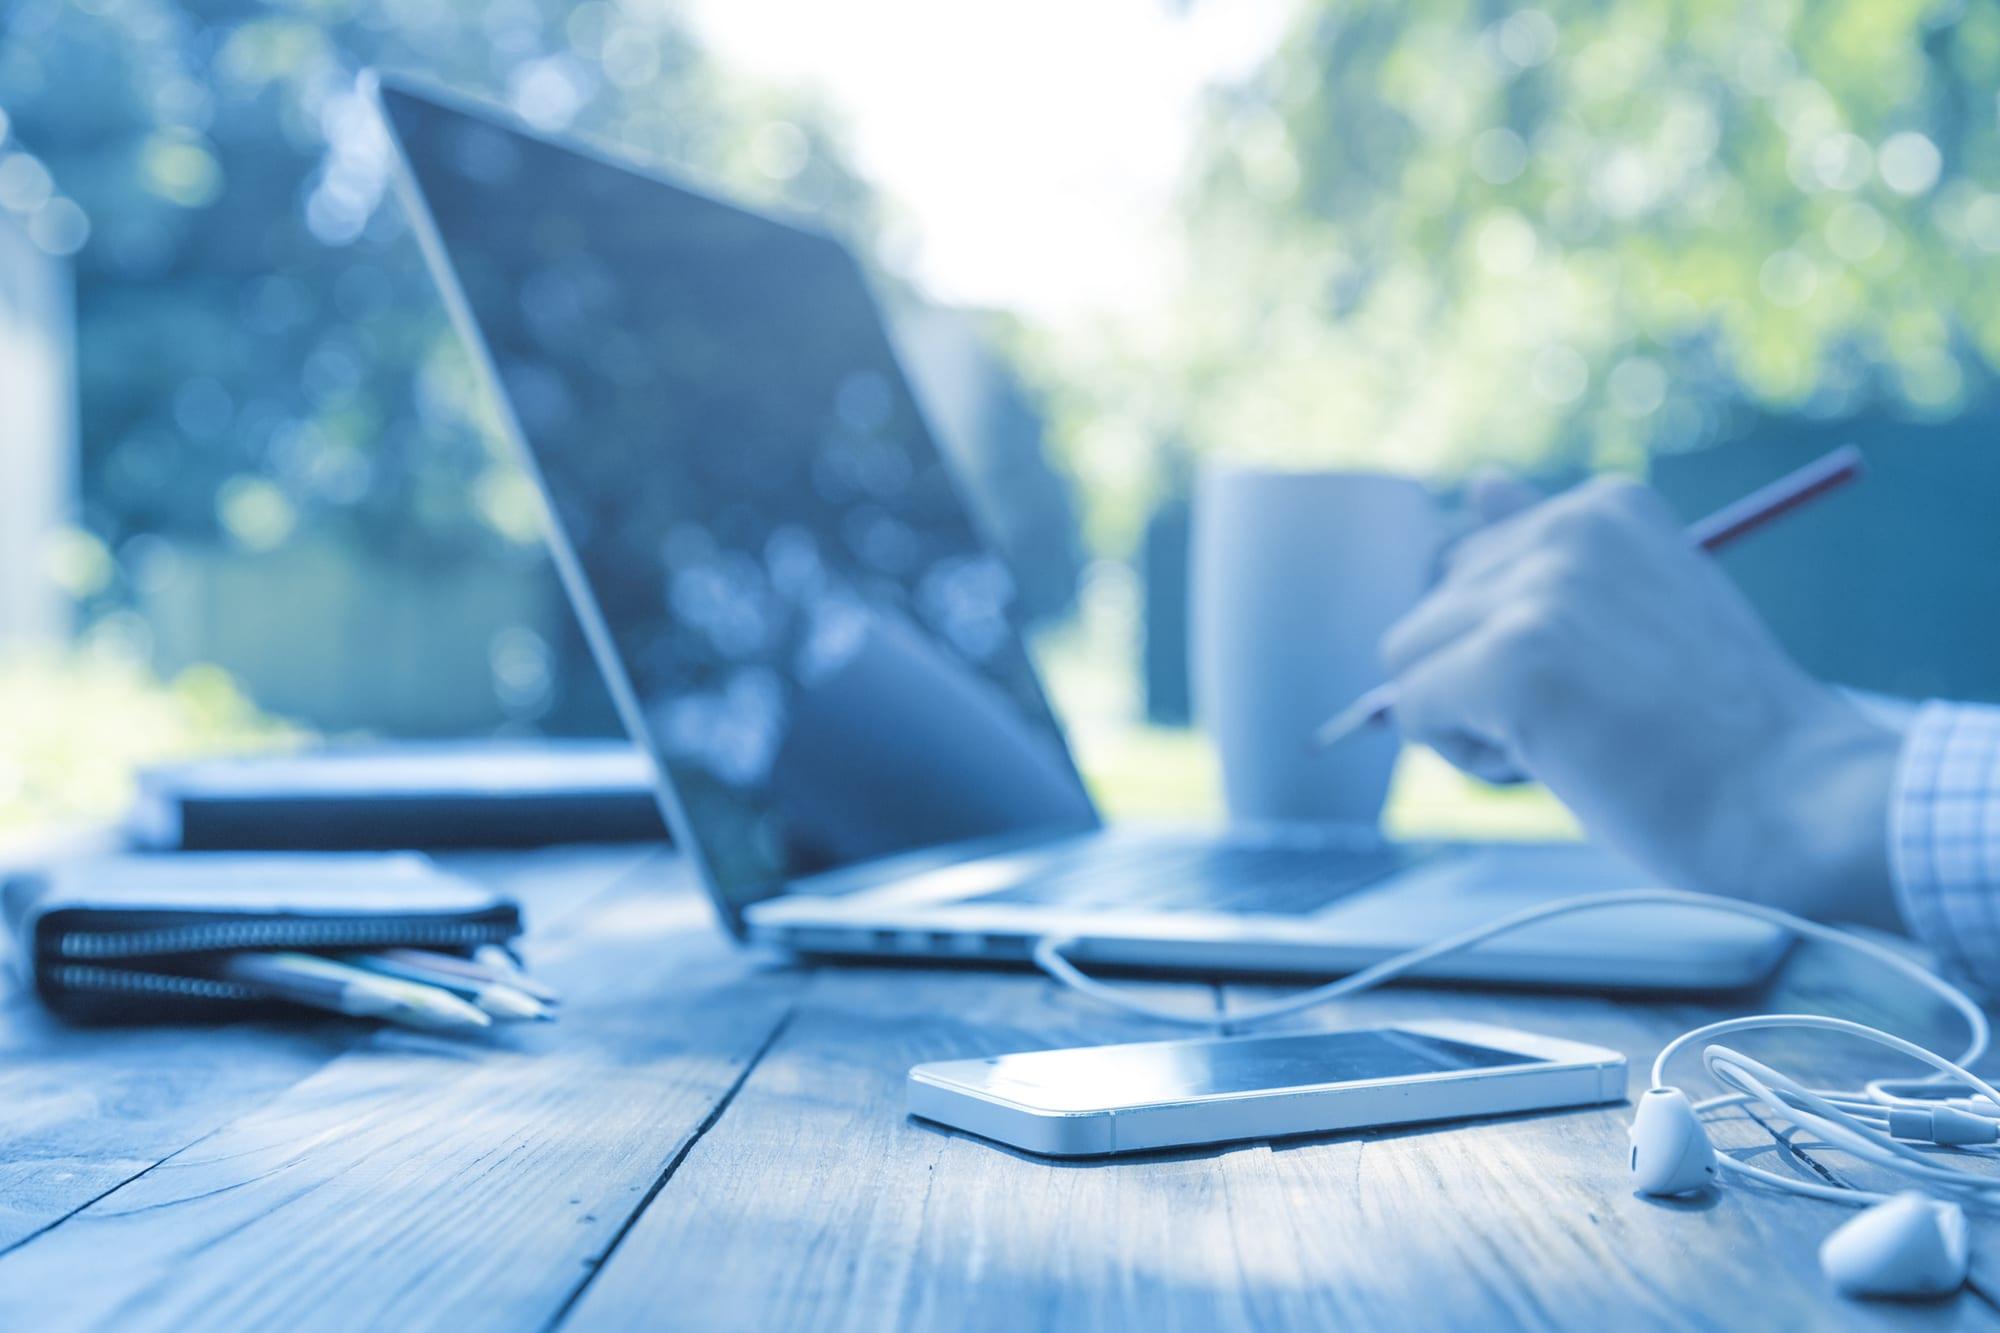 laptop-on-desk